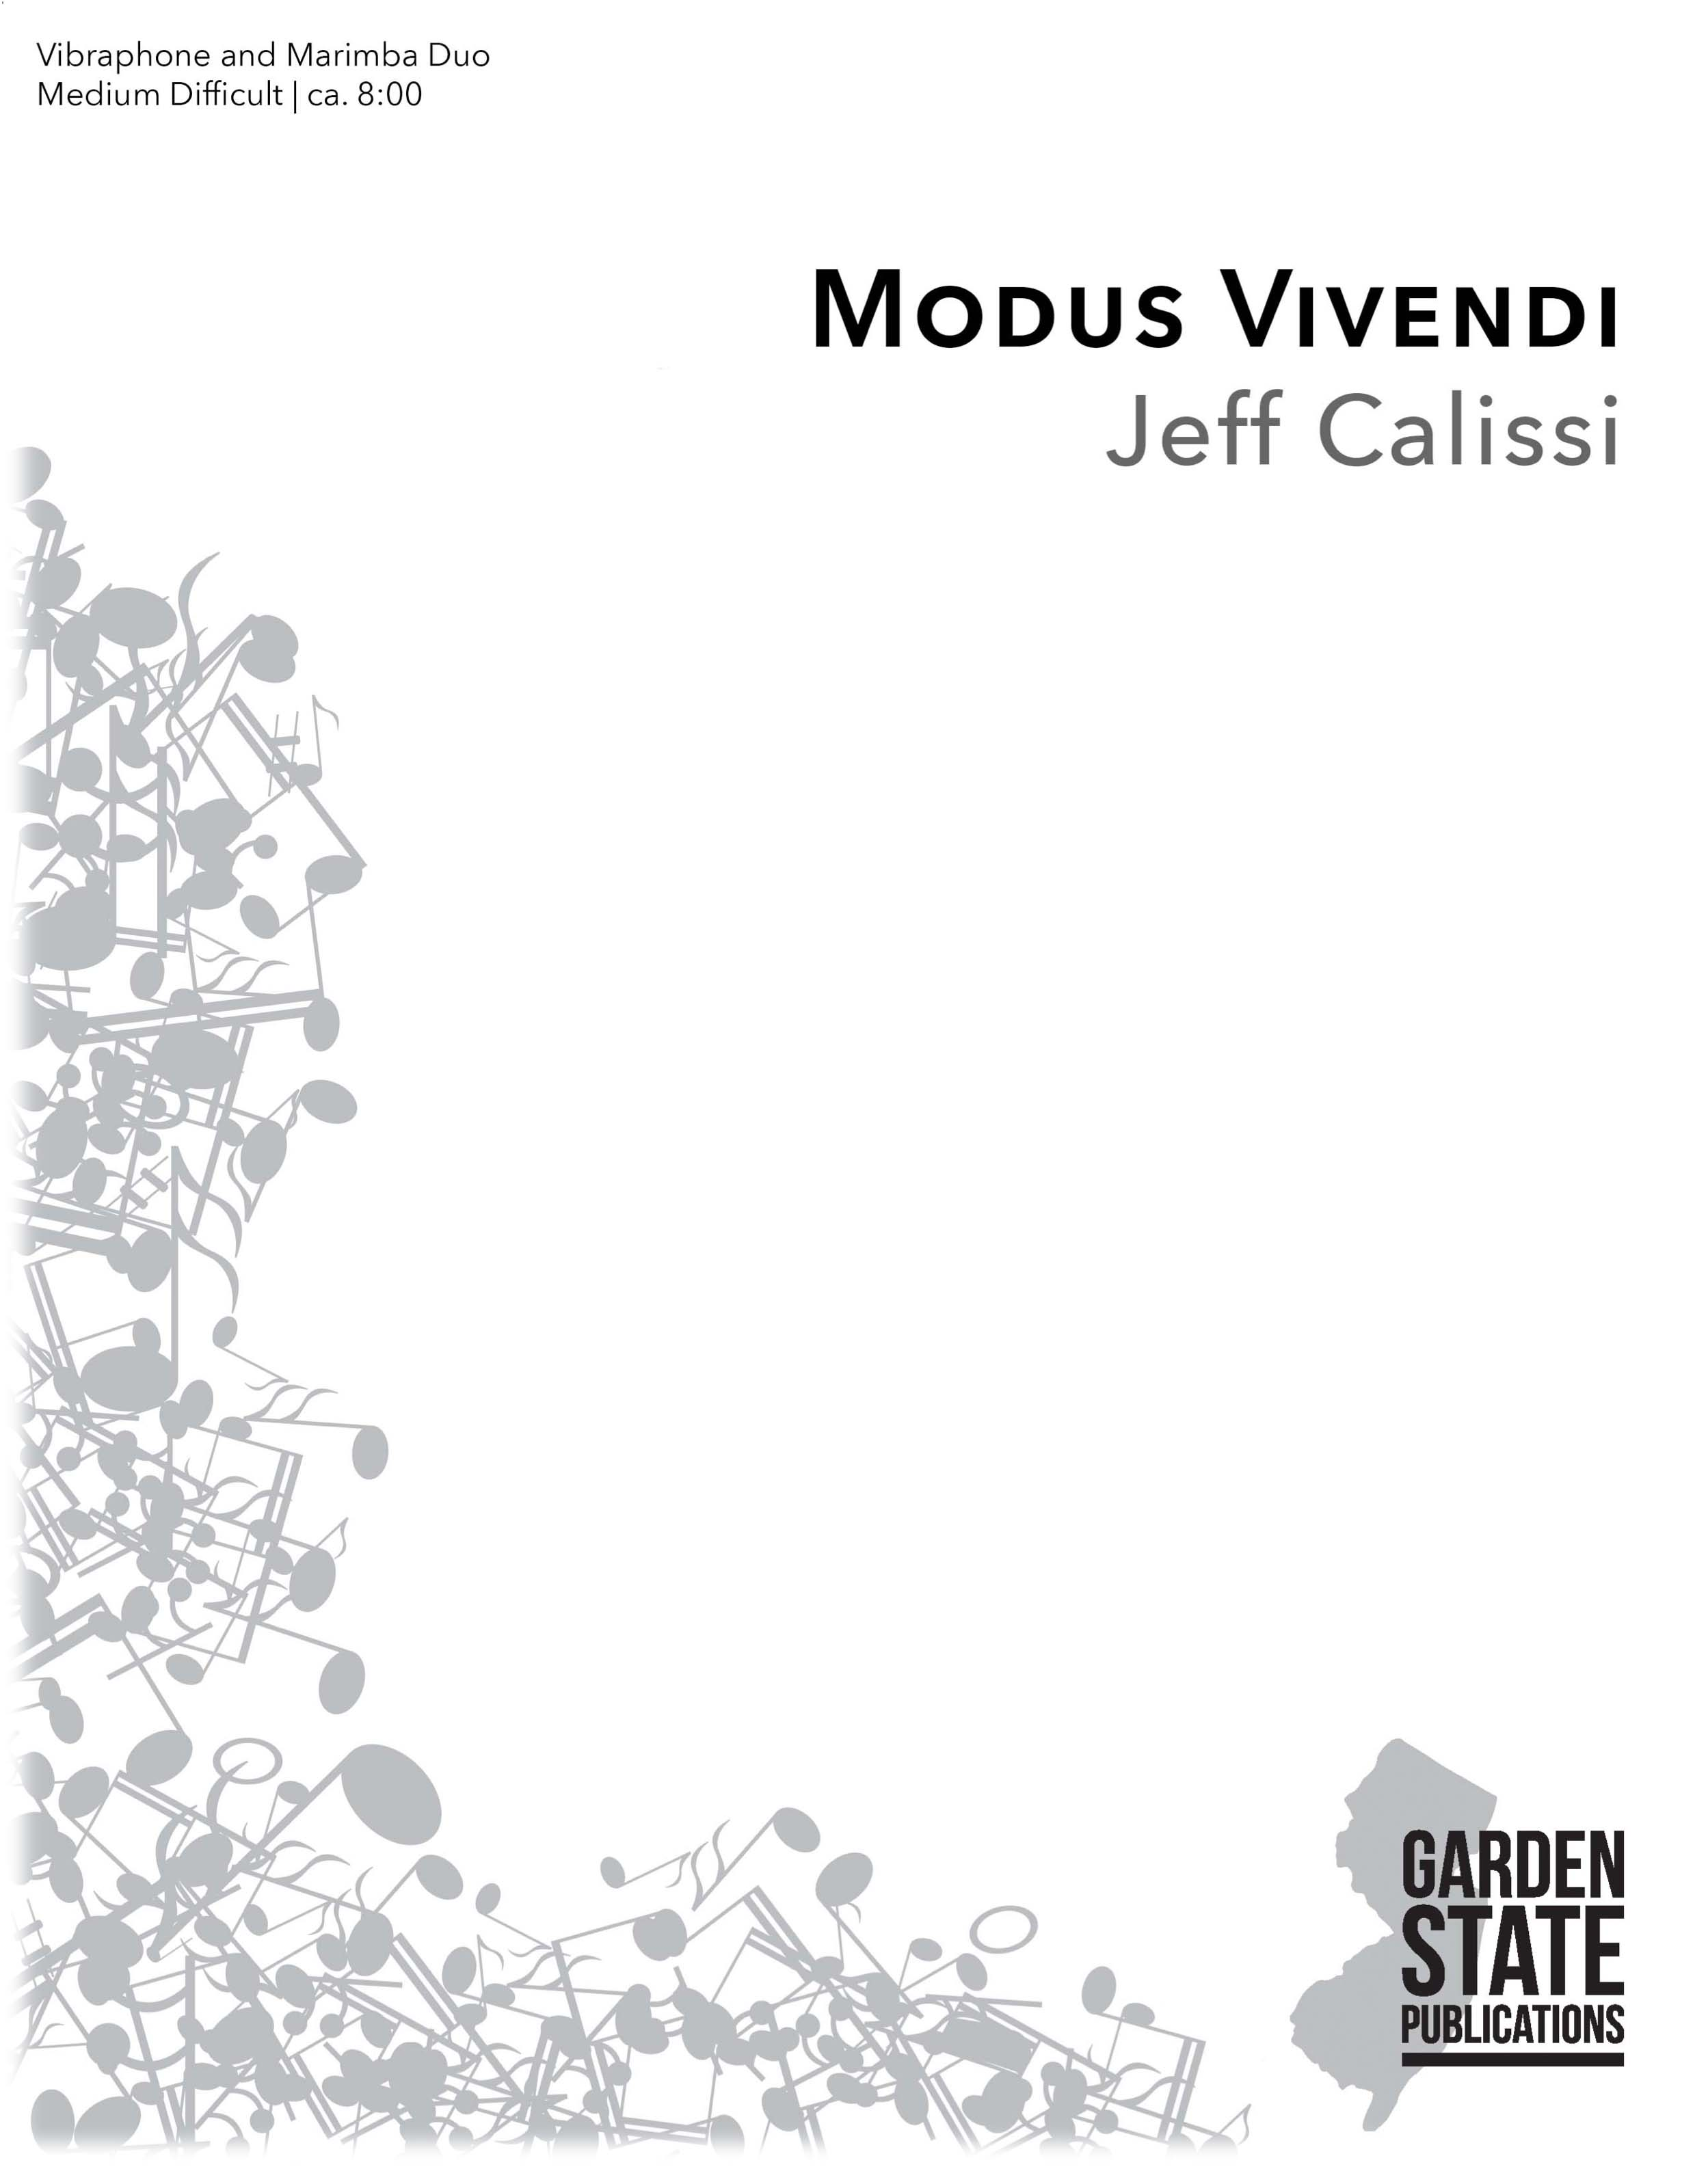 Modus Vivendi cover.jpg